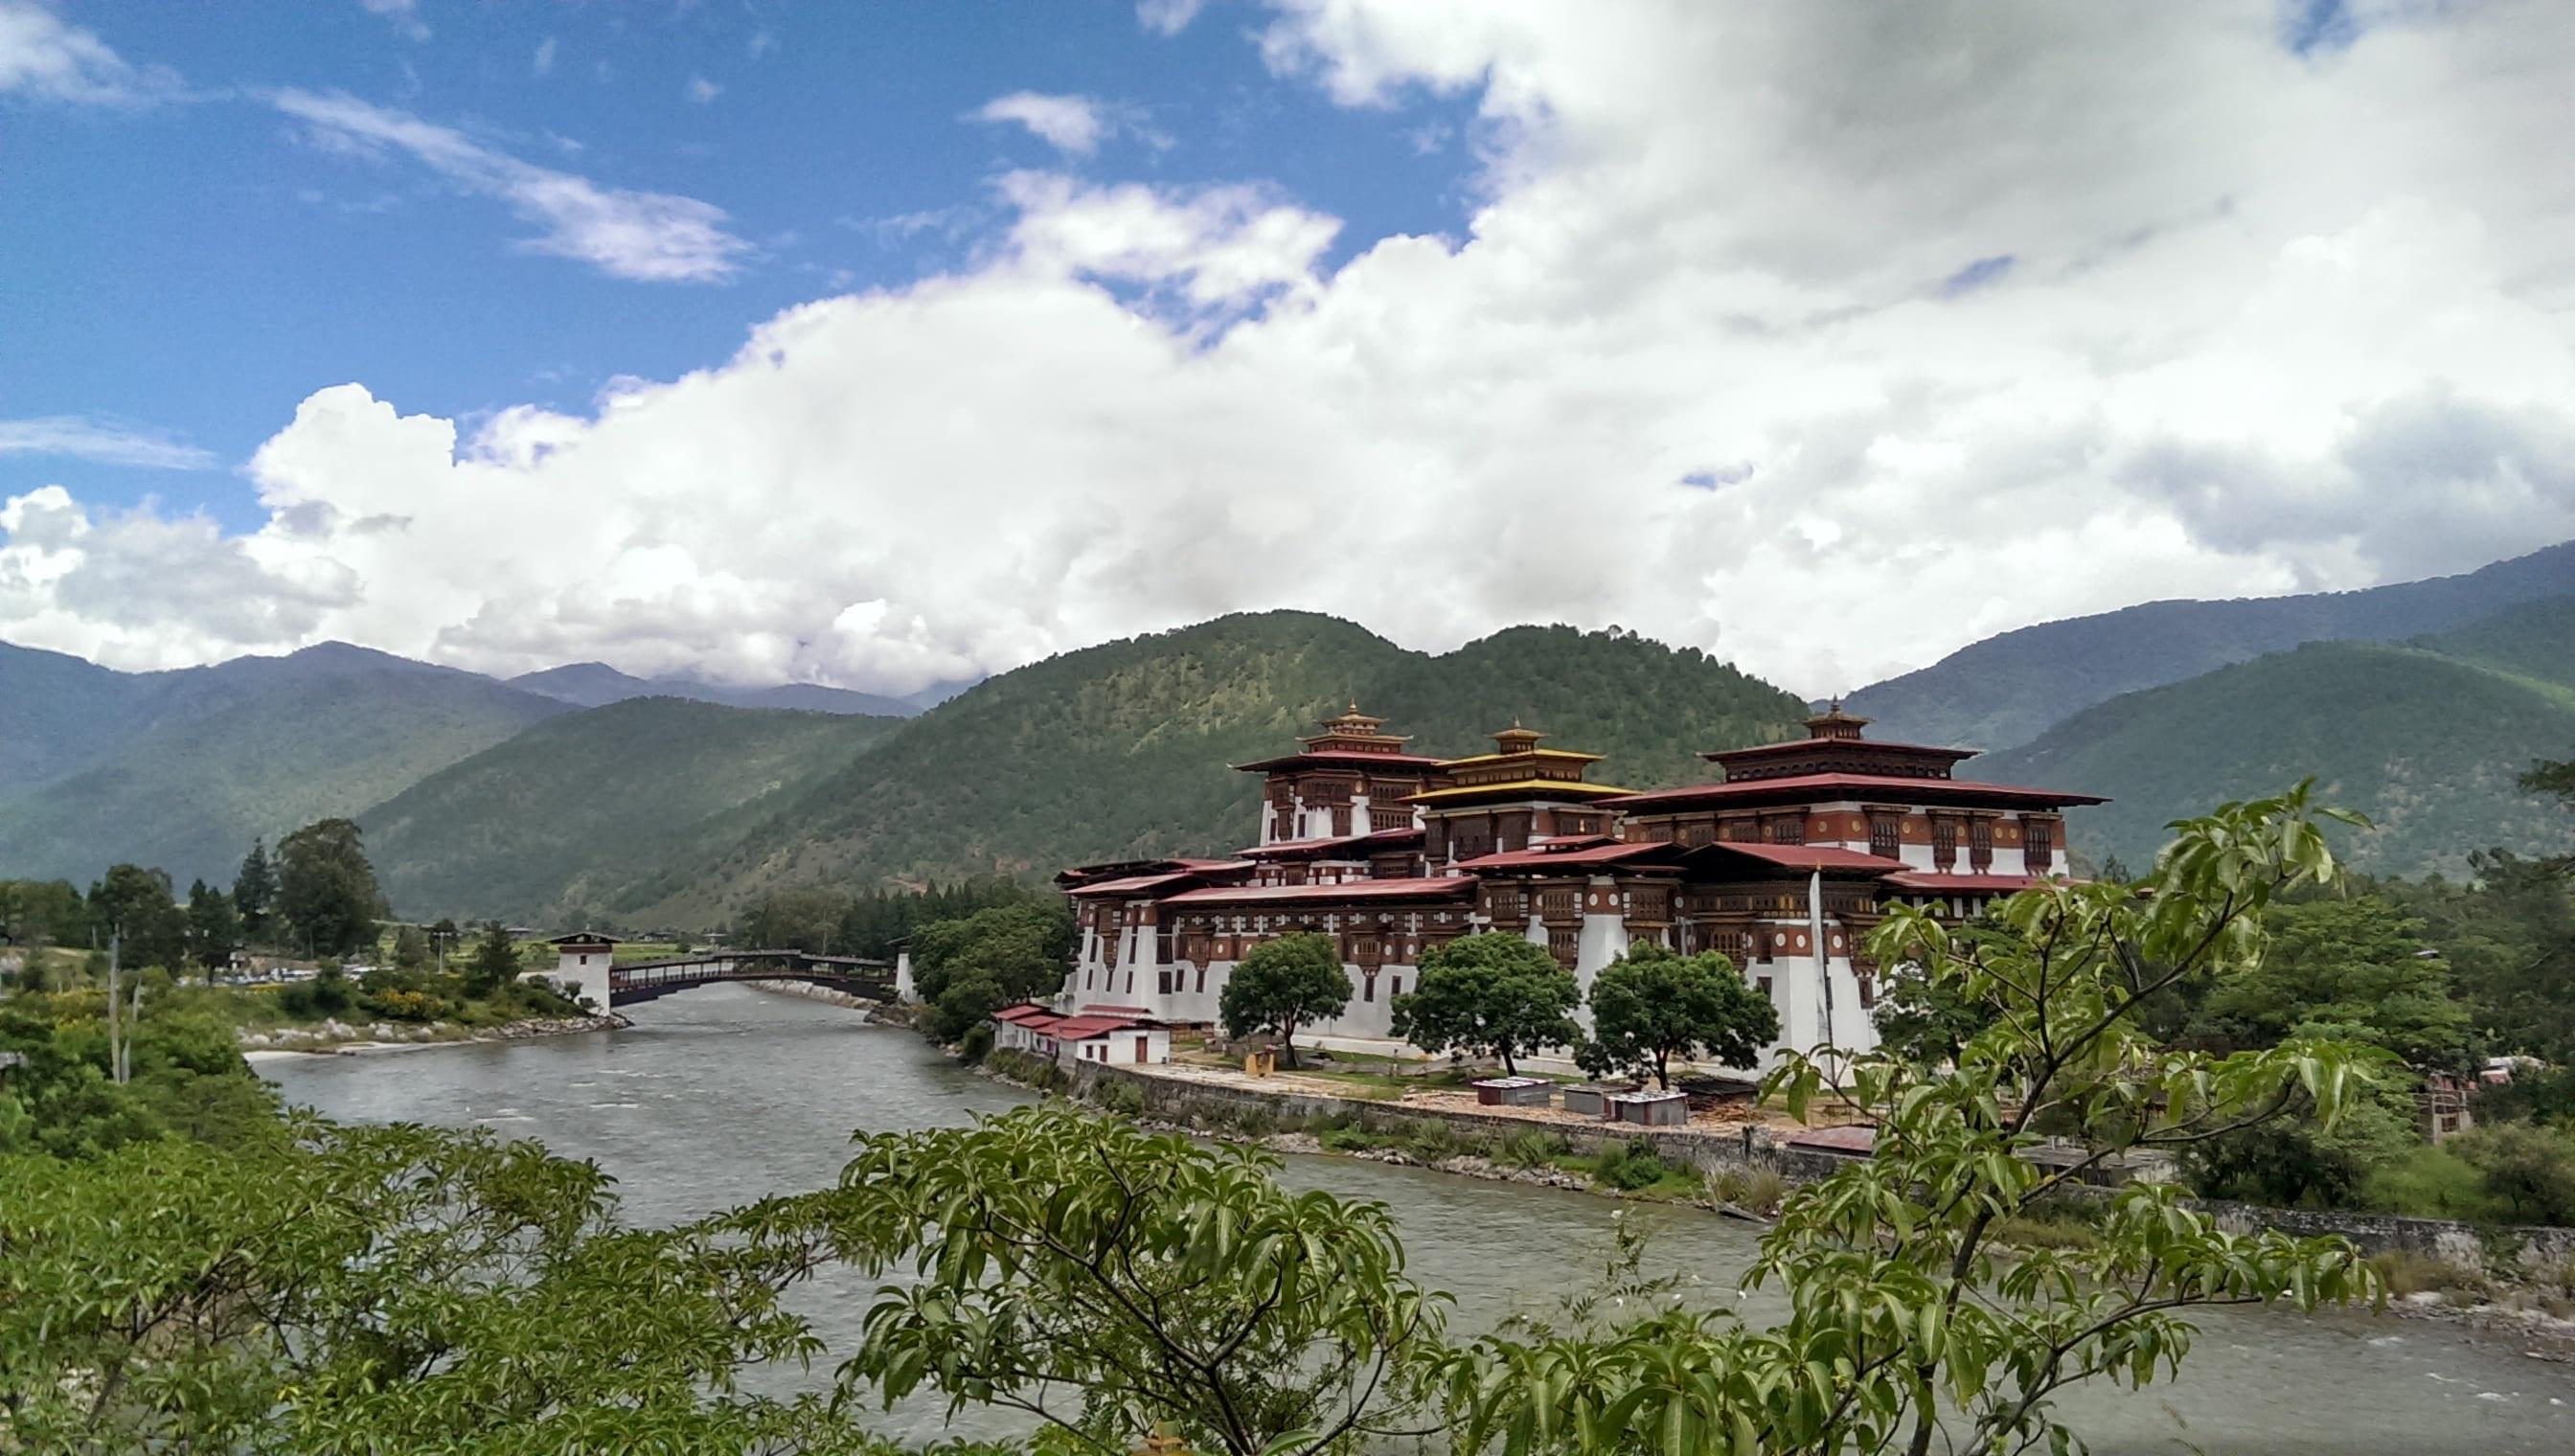 10-DAY CENTRAL BHUTAN TOUR